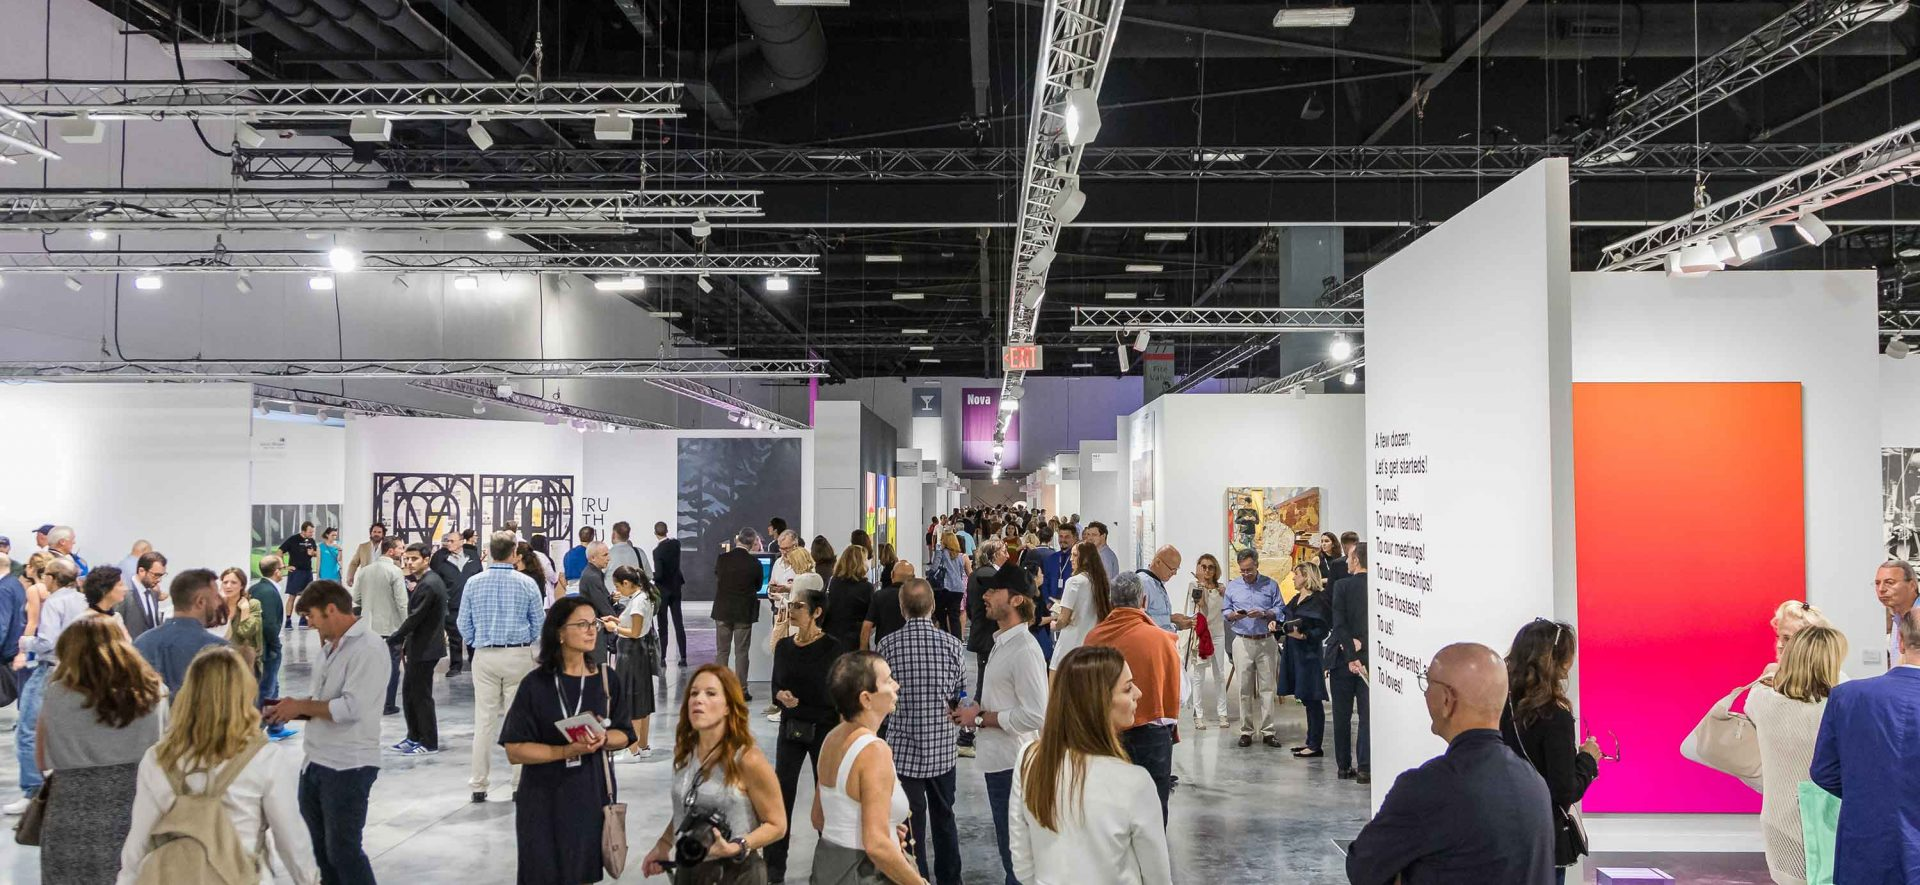 Art Basel returns to Miami Beach in December 2018.